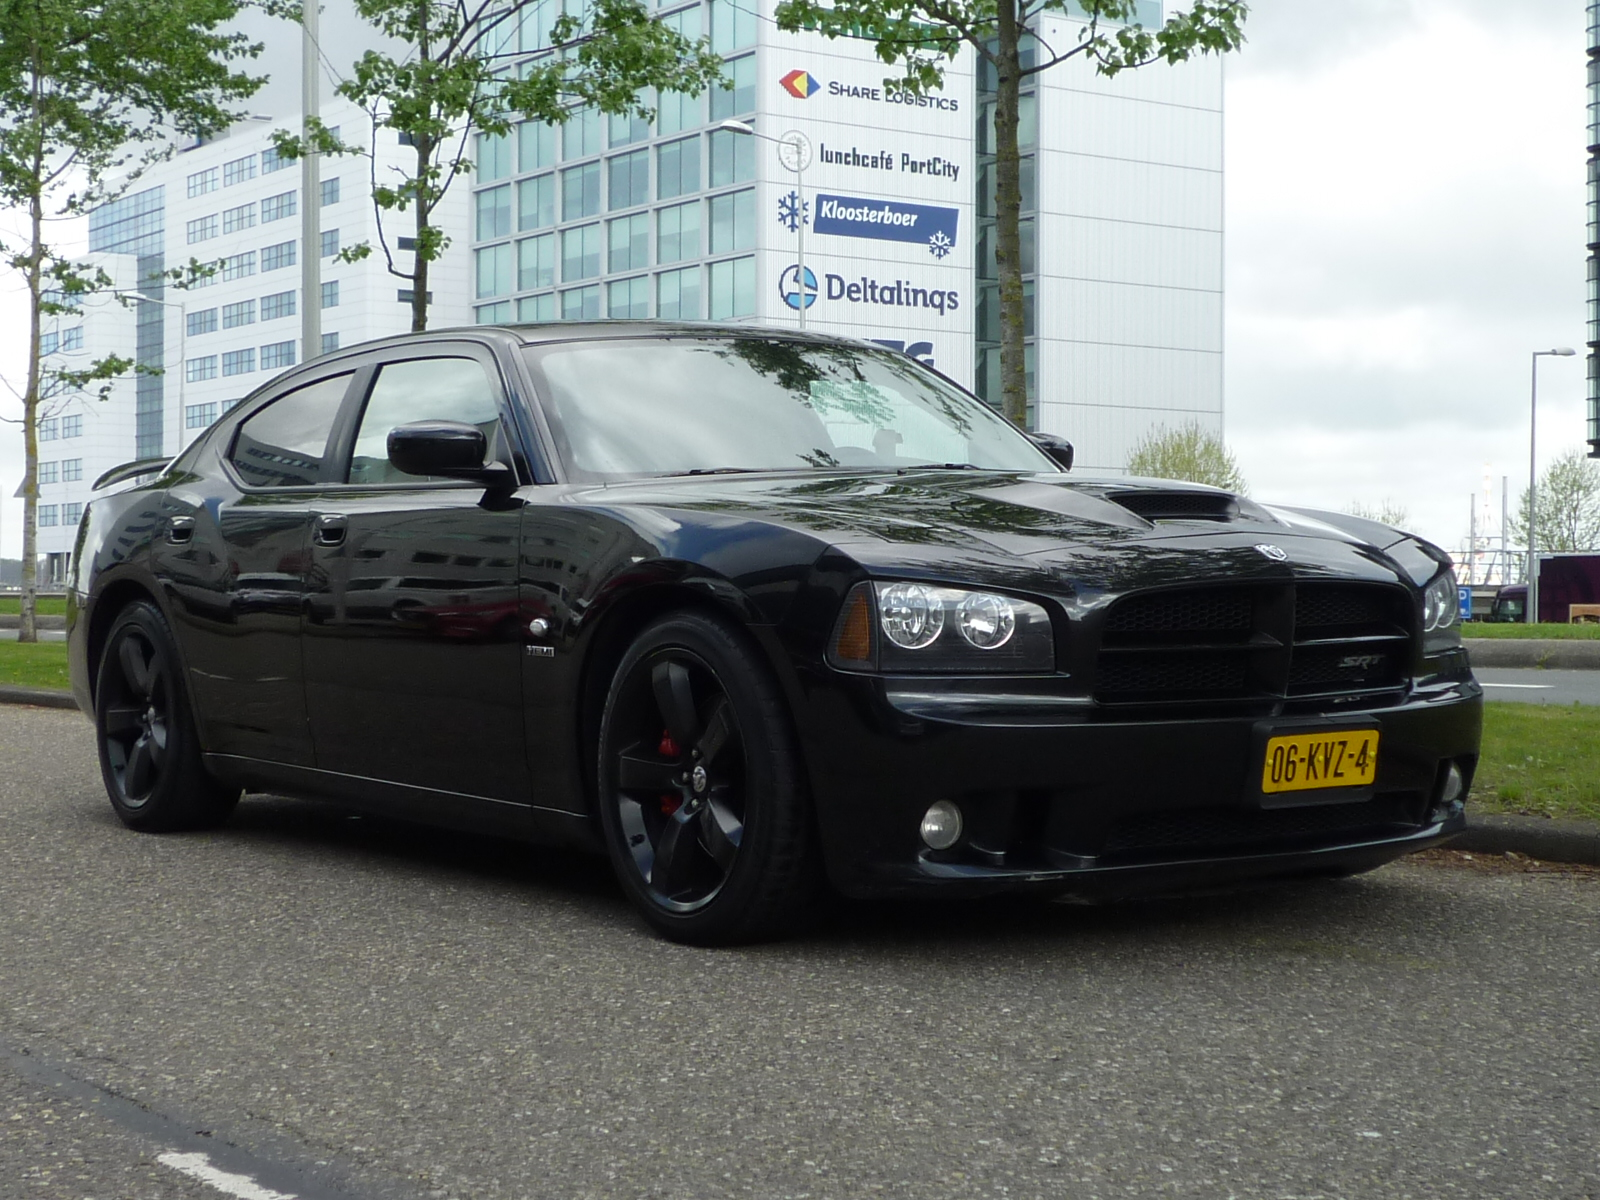 Dodge Charger occasion bij Pietersen Rotterdam